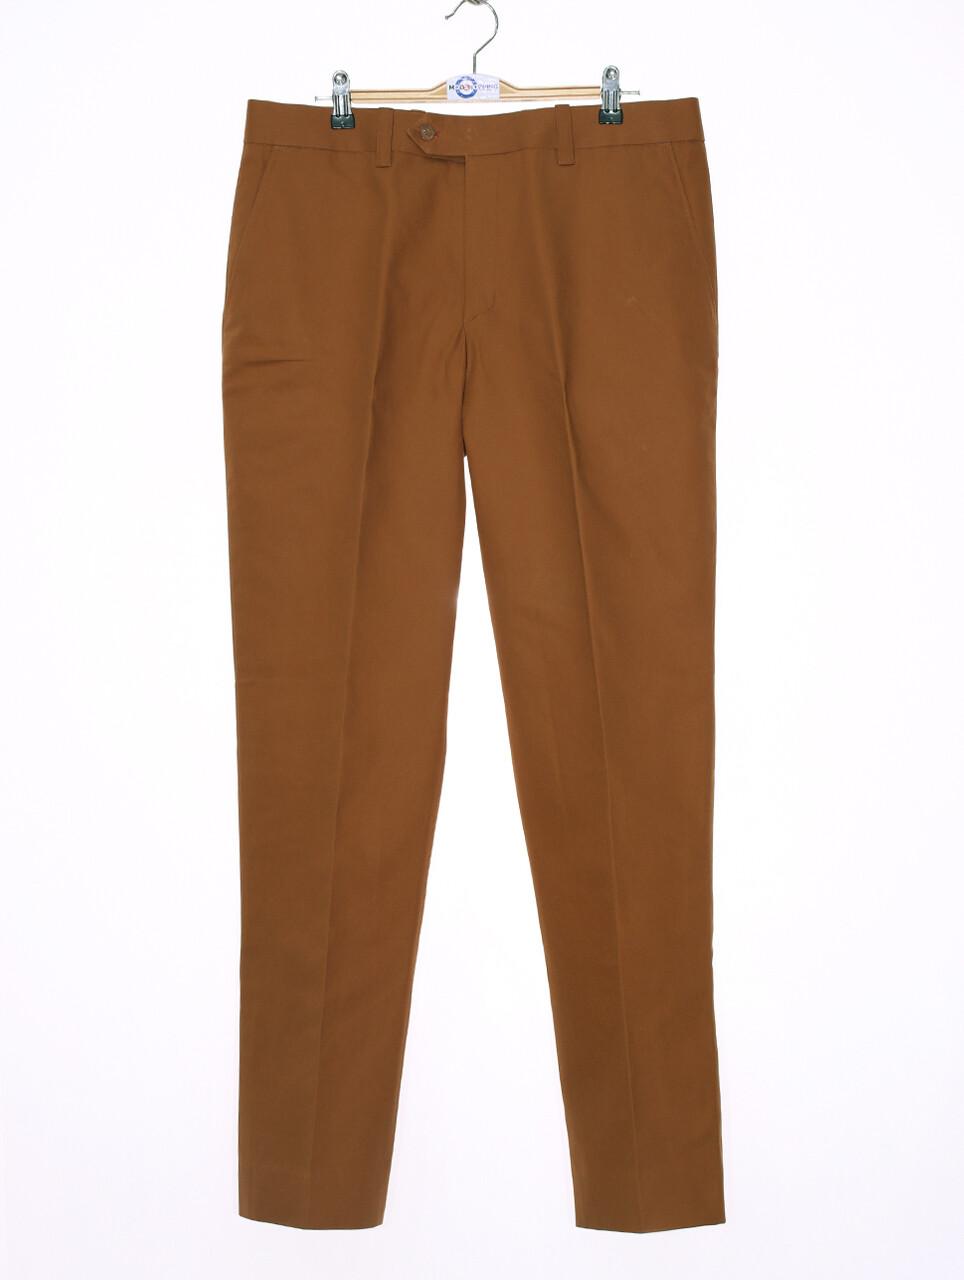 Sta Press Trousers  60s Mod Classic Burnt Orange Men's Trouser